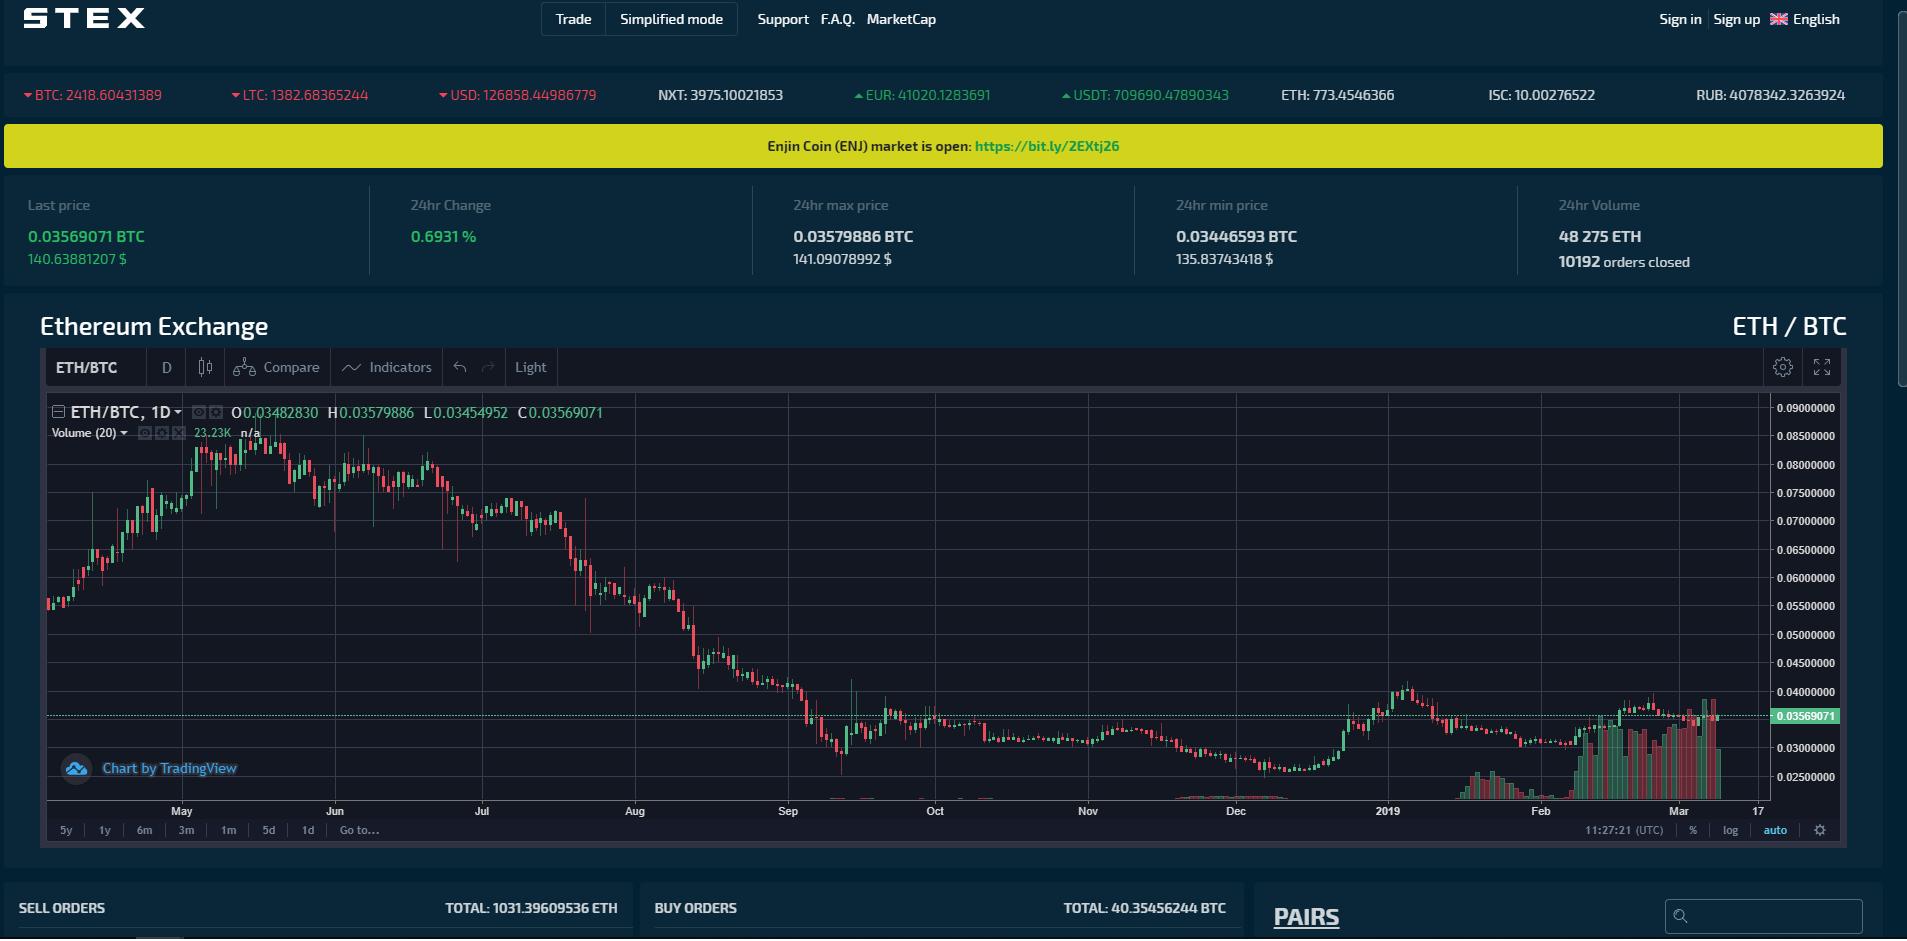 STEX.com Trading View